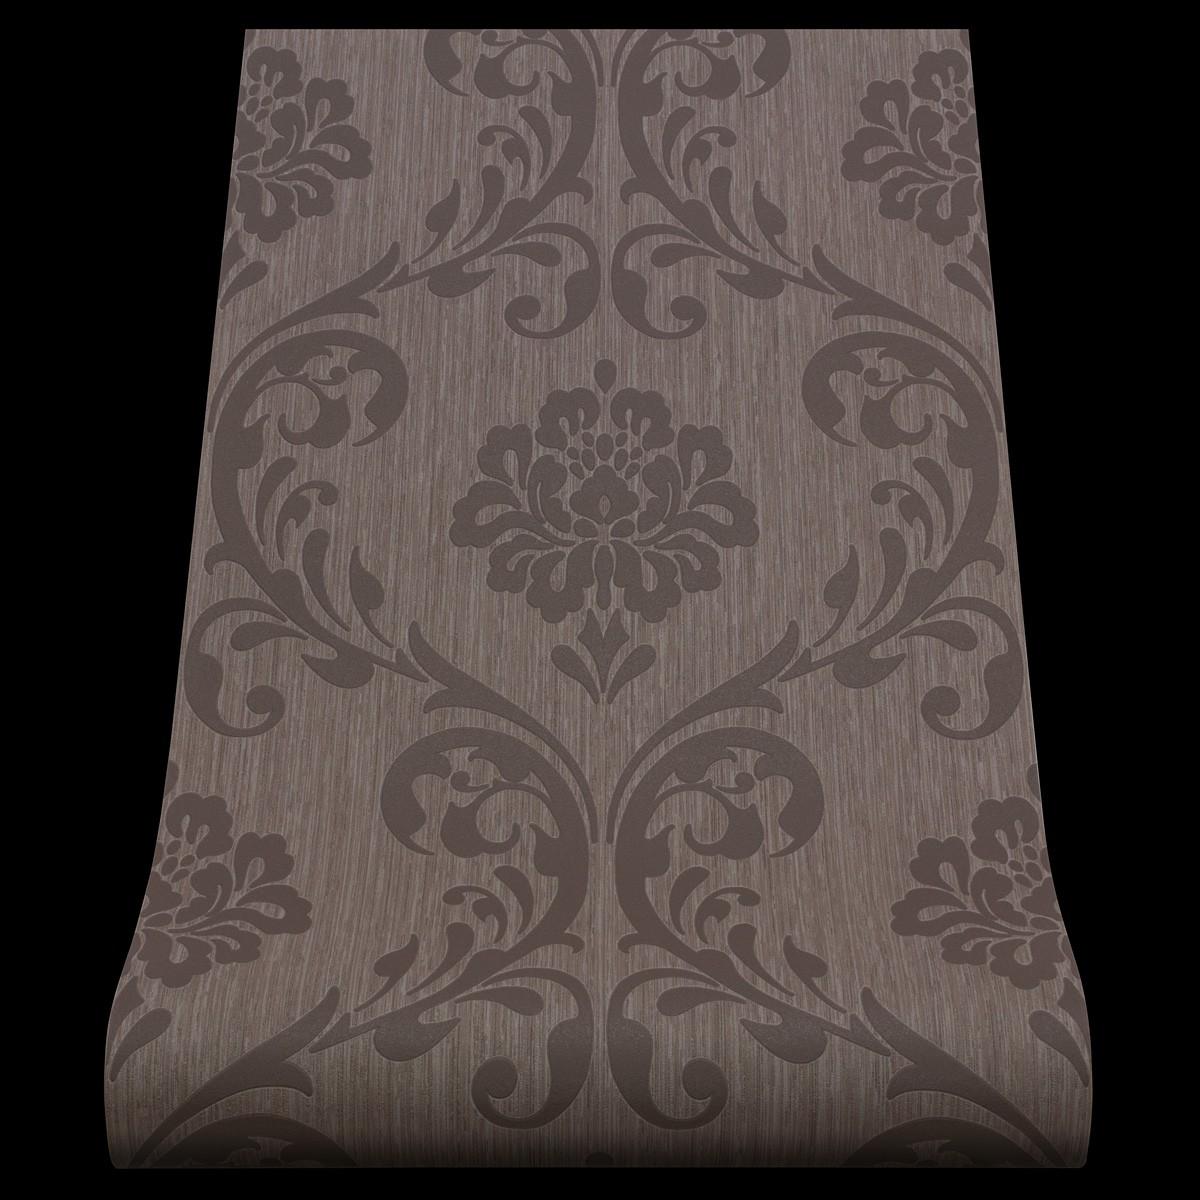 13110 40 1 rolle vlies tapete ornament barock design braun. Black Bedroom Furniture Sets. Home Design Ideas